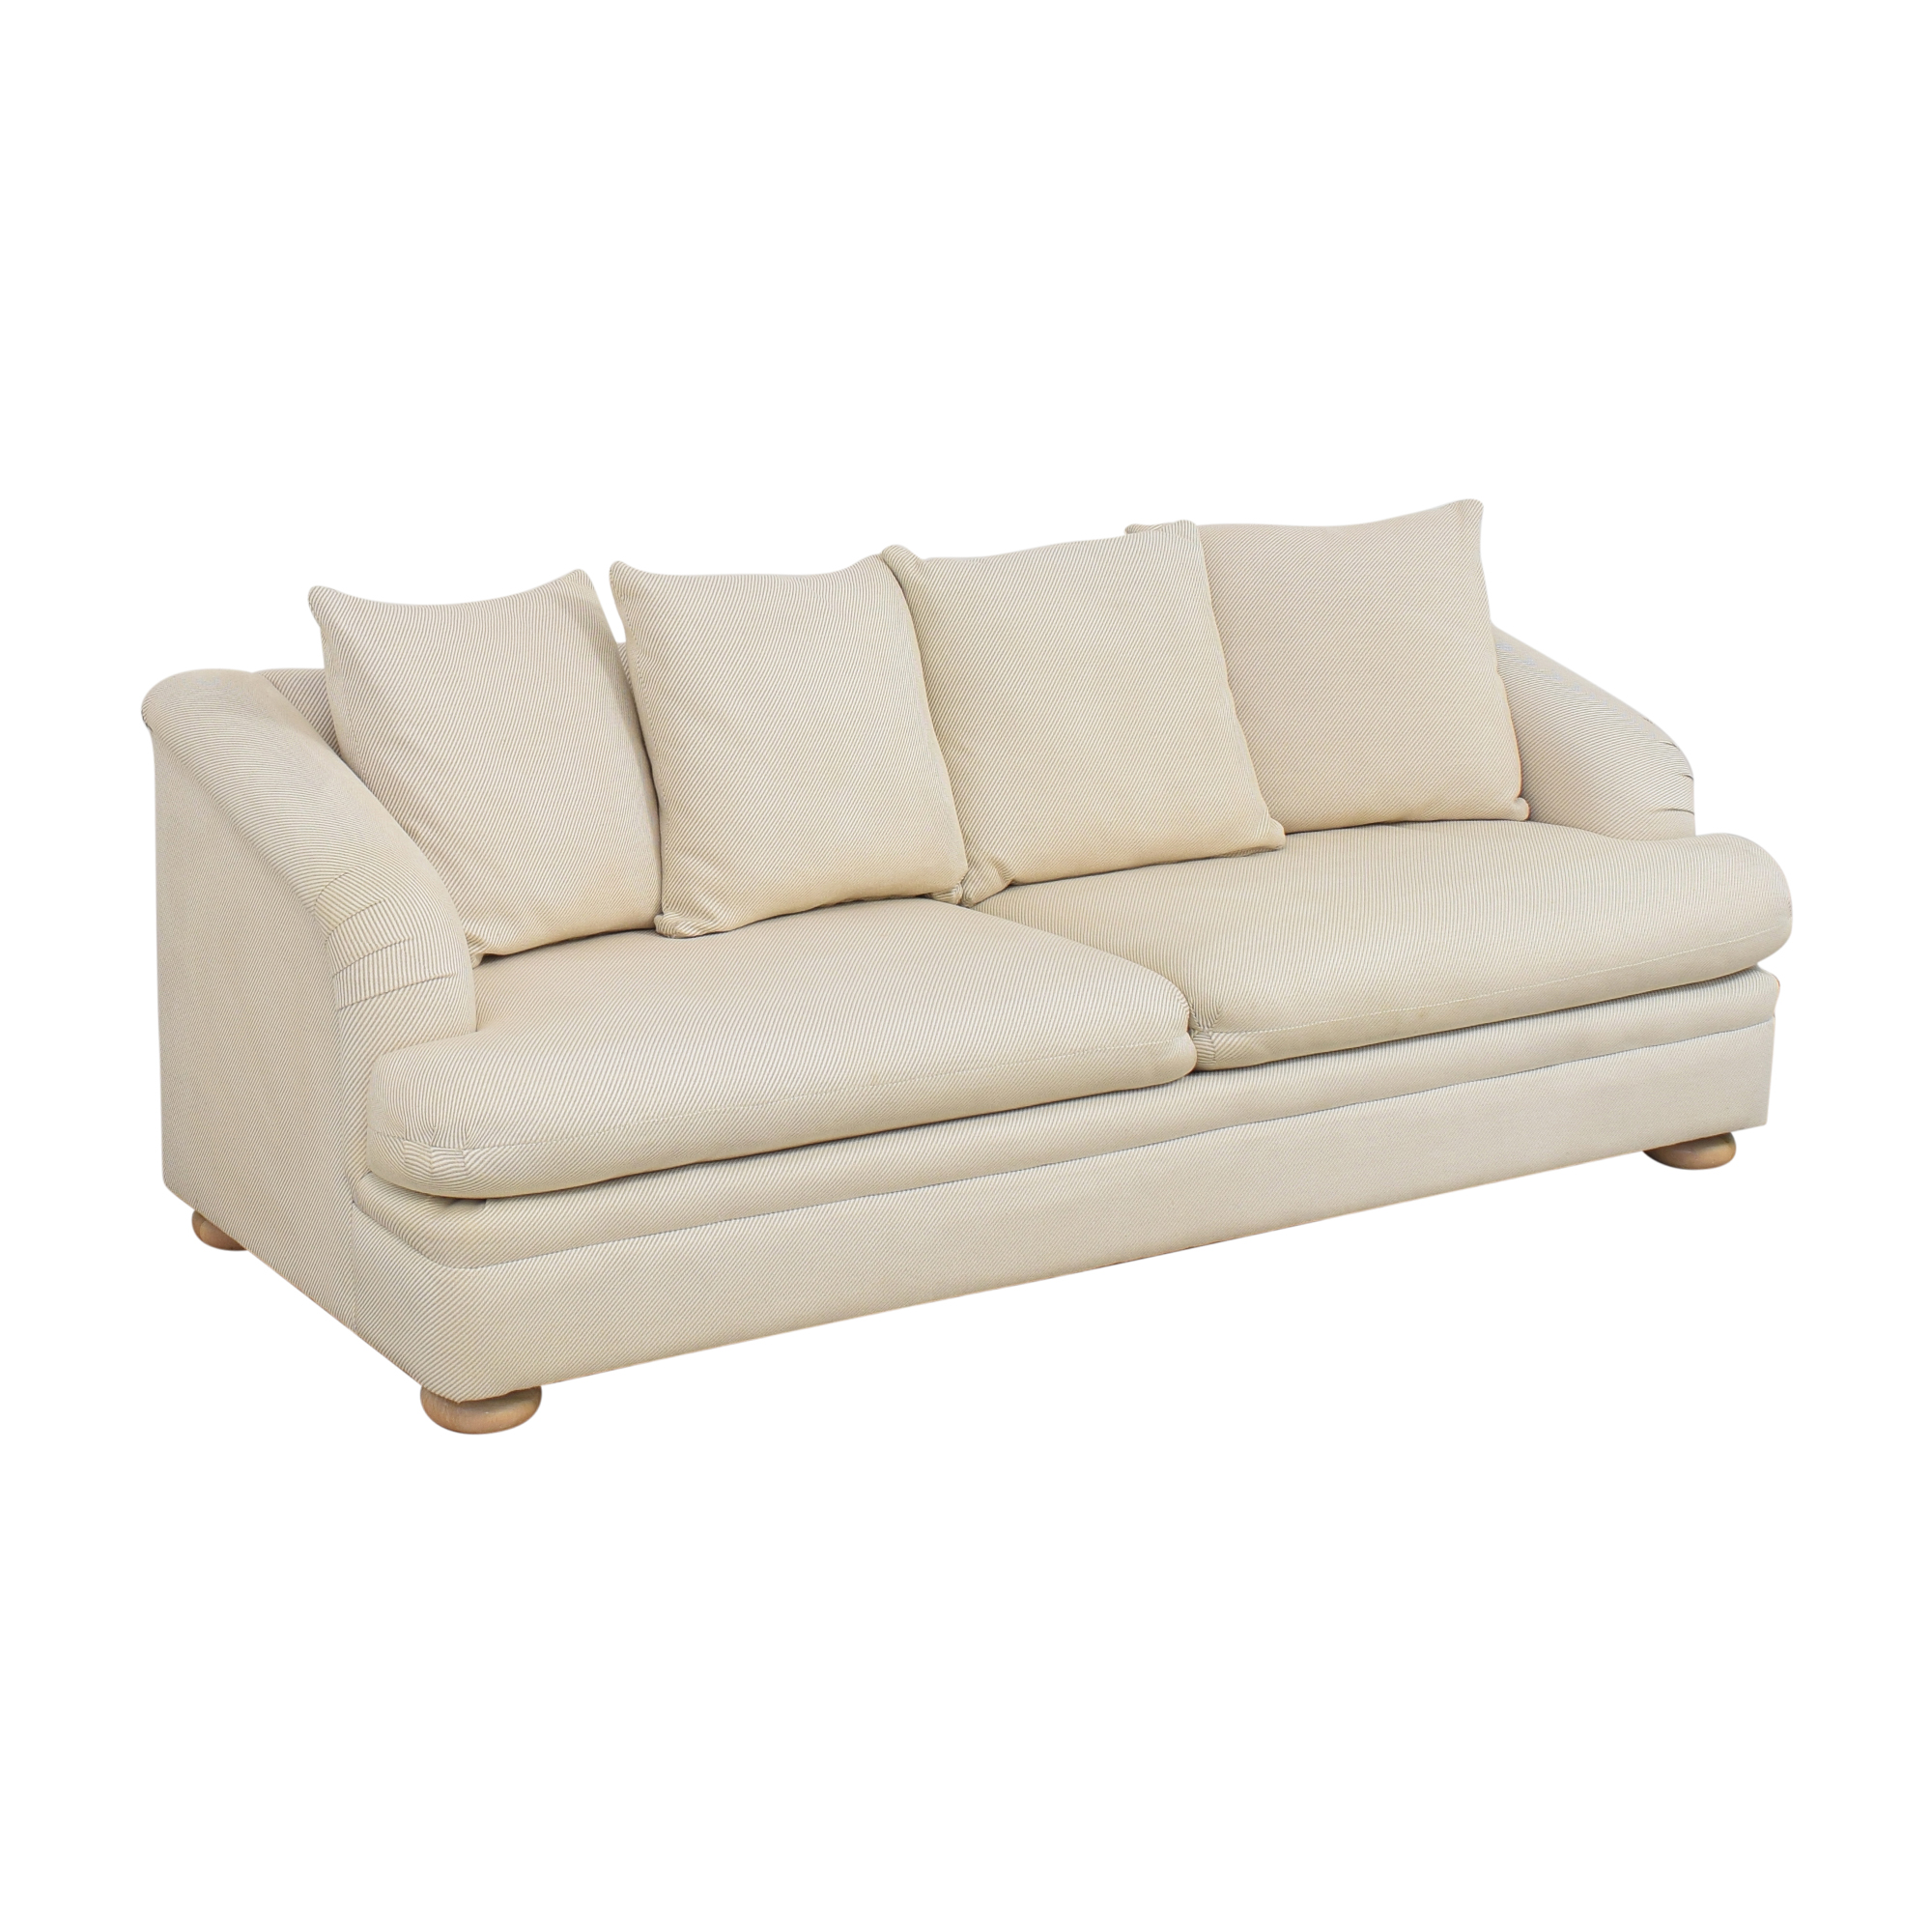 McCreary Modern McCreary Modern English Roll Arm Sofa Sofas